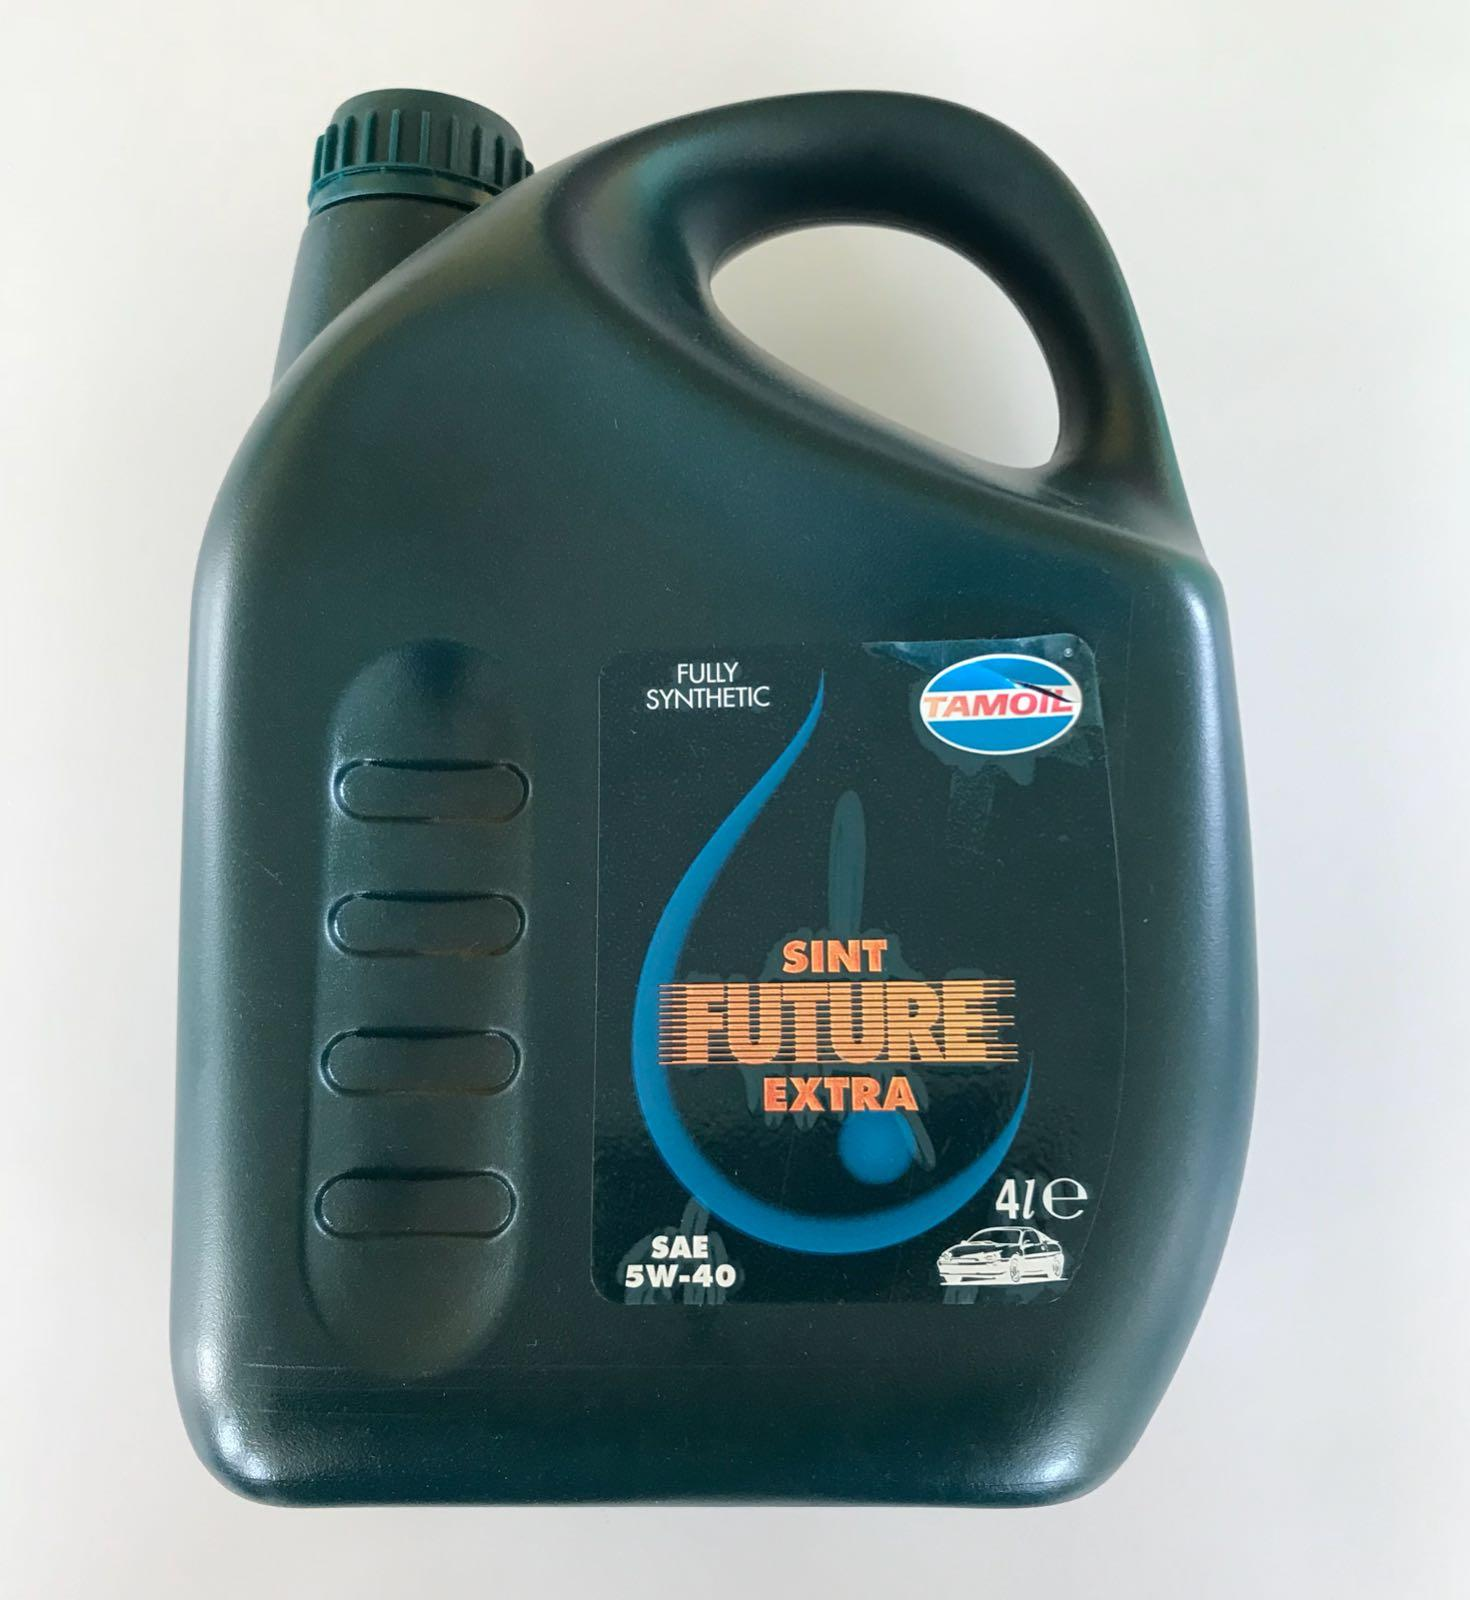 Tamoil Sint Future Extra SAE 5W/40 barattolo 4 Litri